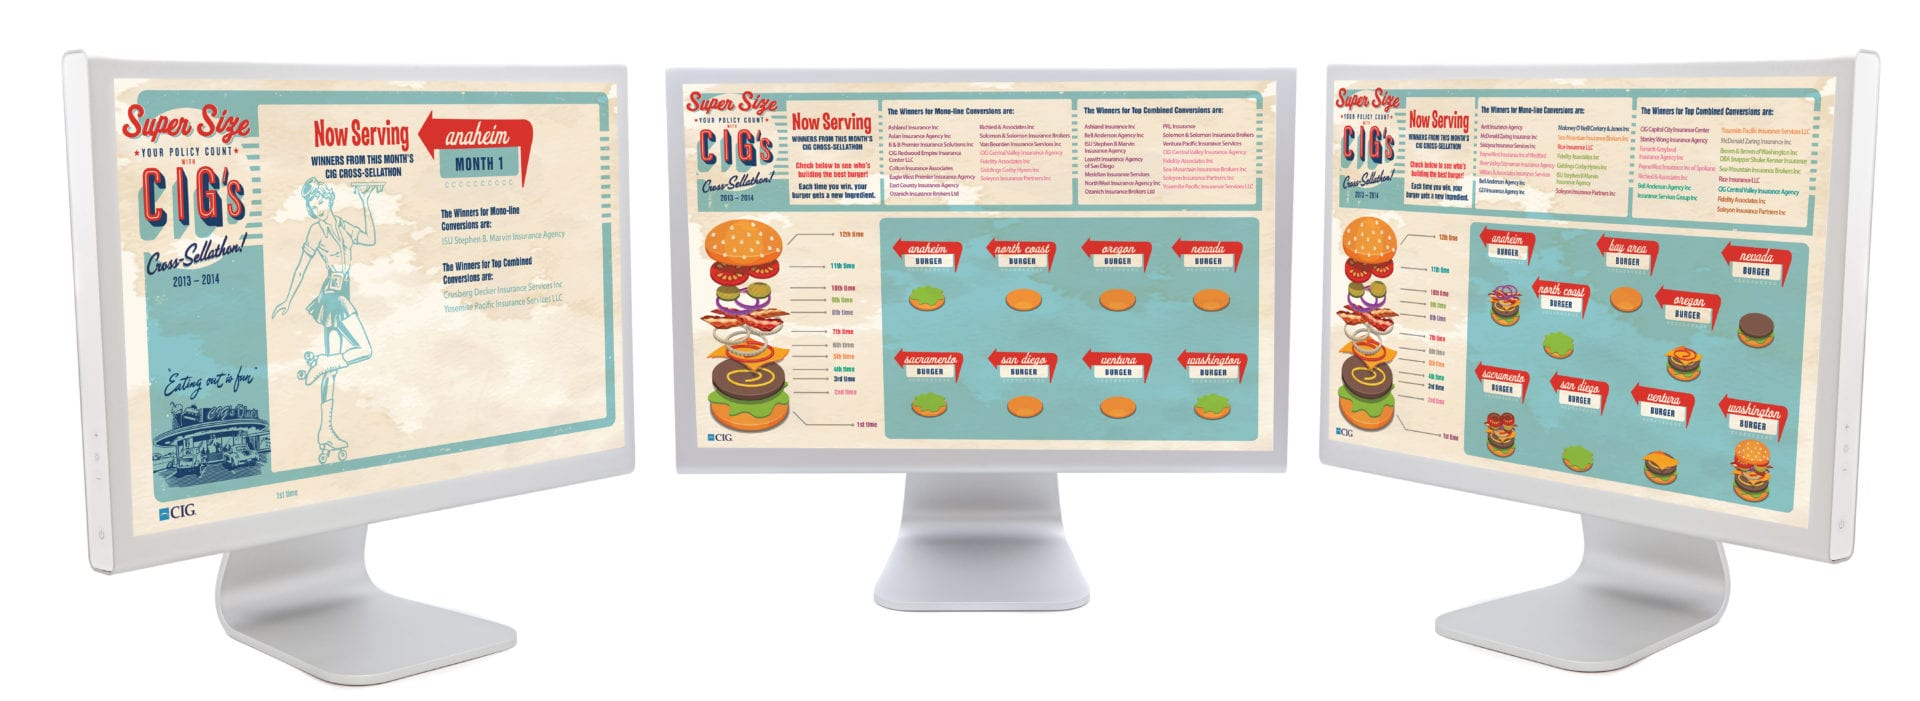 3 monitors with vintage restaurant menu graphics